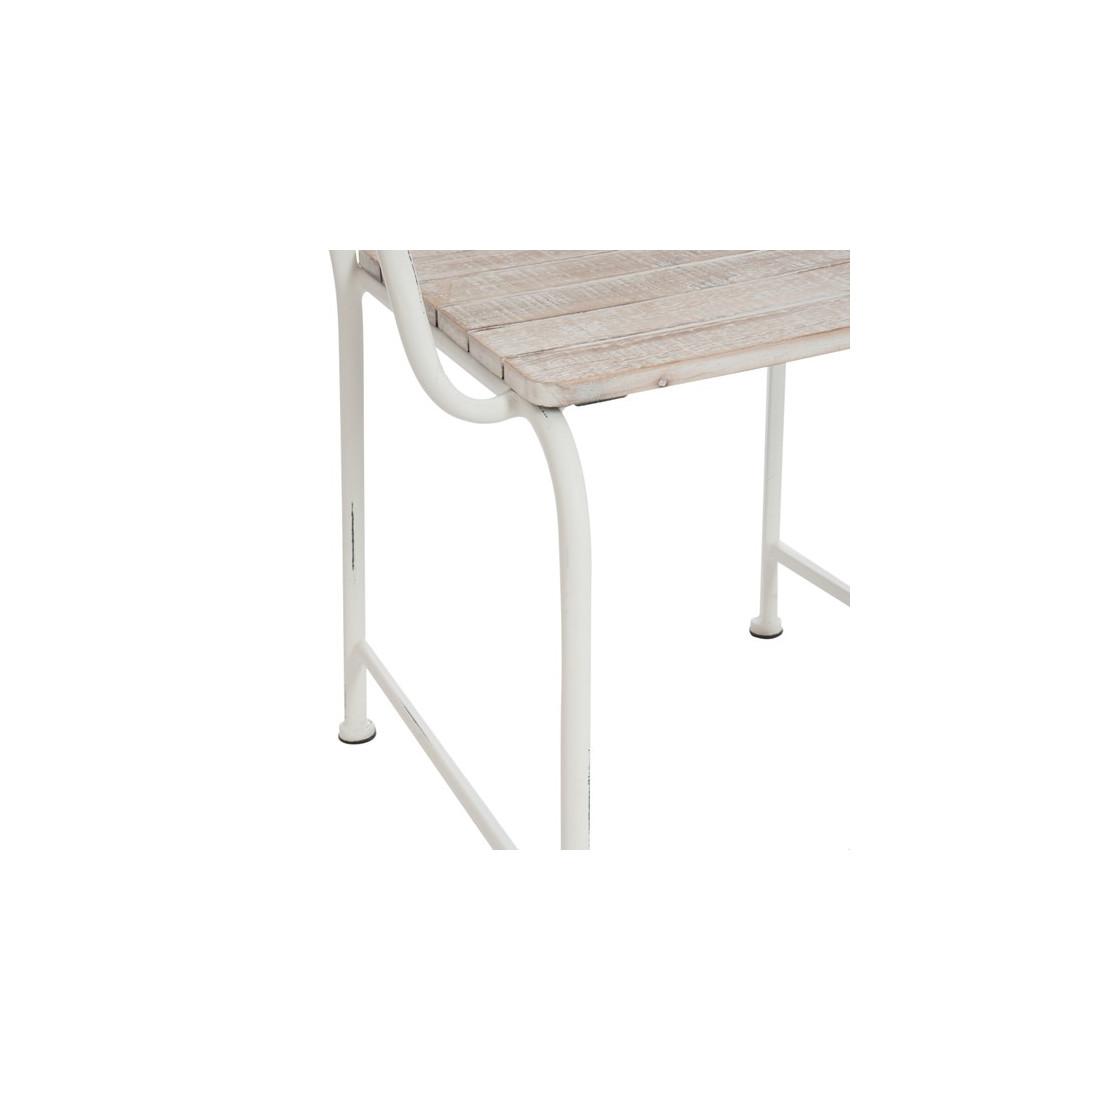 Chaise bois blanchi bord de mer roxane univers salle for Chaise bois blanc